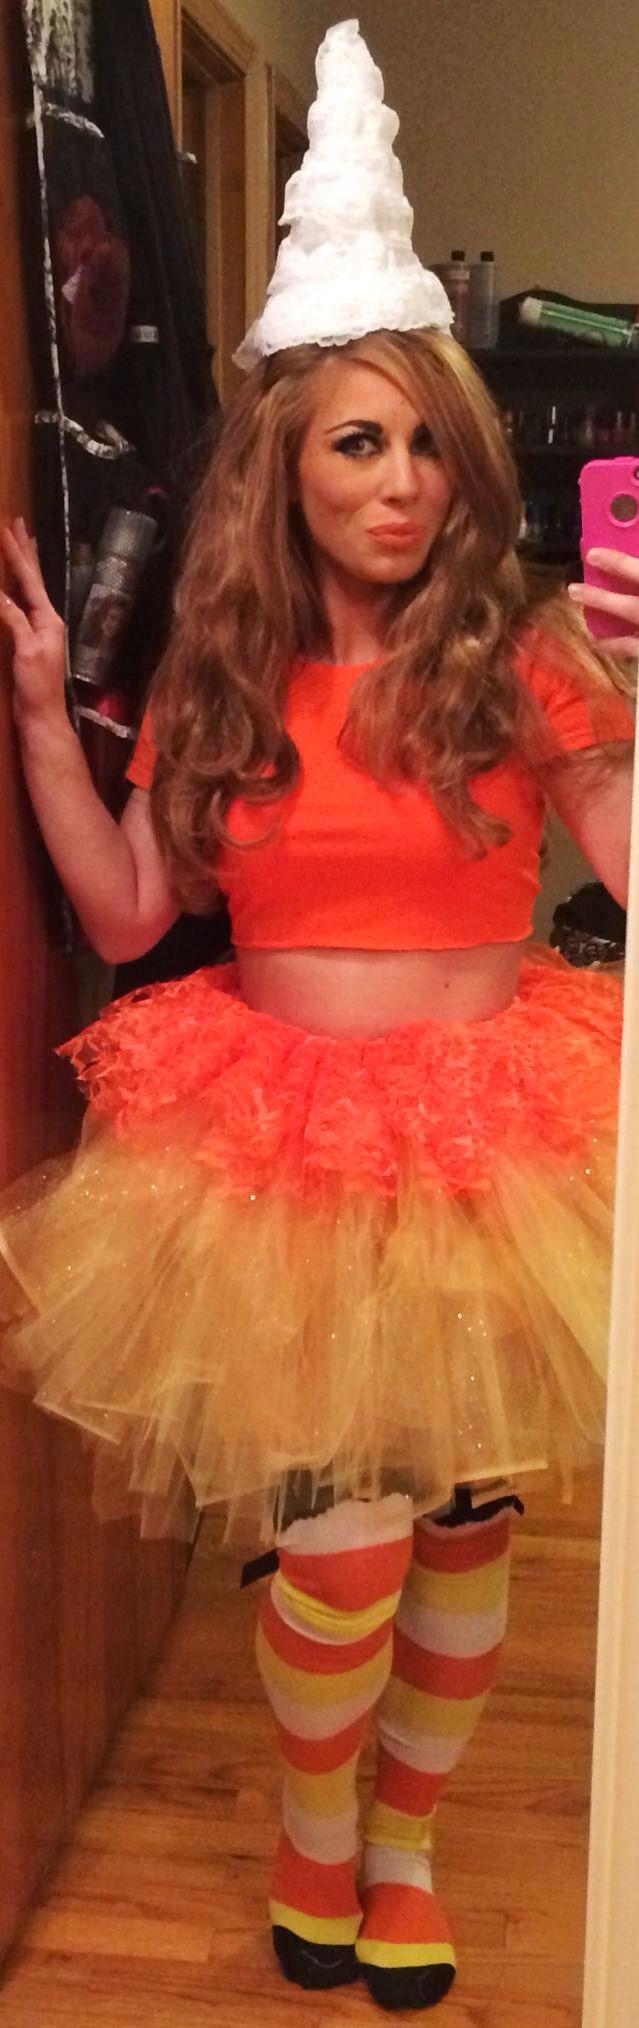 Halloween costume. DIY Halloween costume. Candy corn Halloween costume. Tulle Halloween costume. Adult Halloween costume.